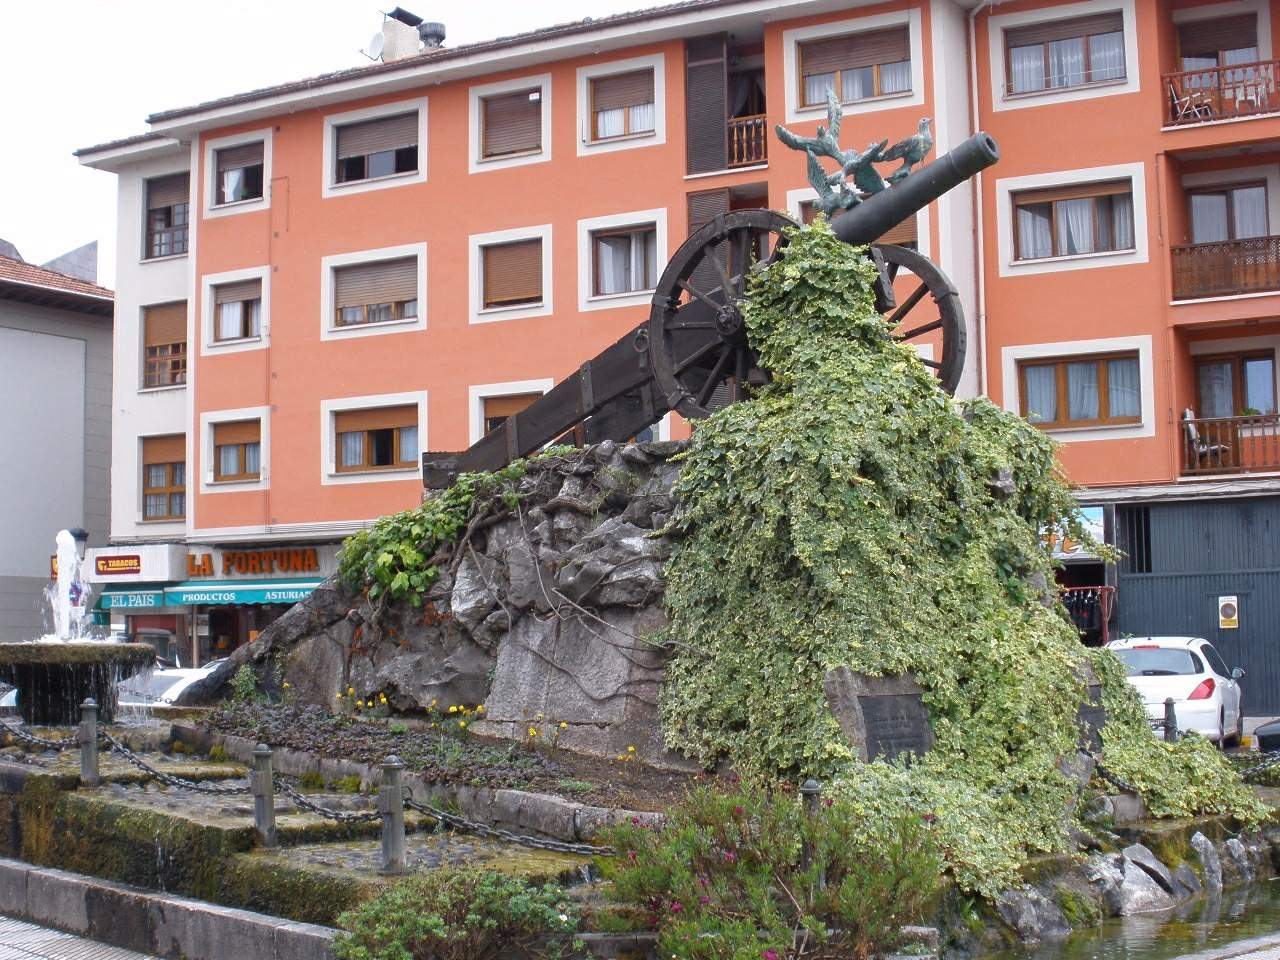 Plaza del Cañon de Arriondas